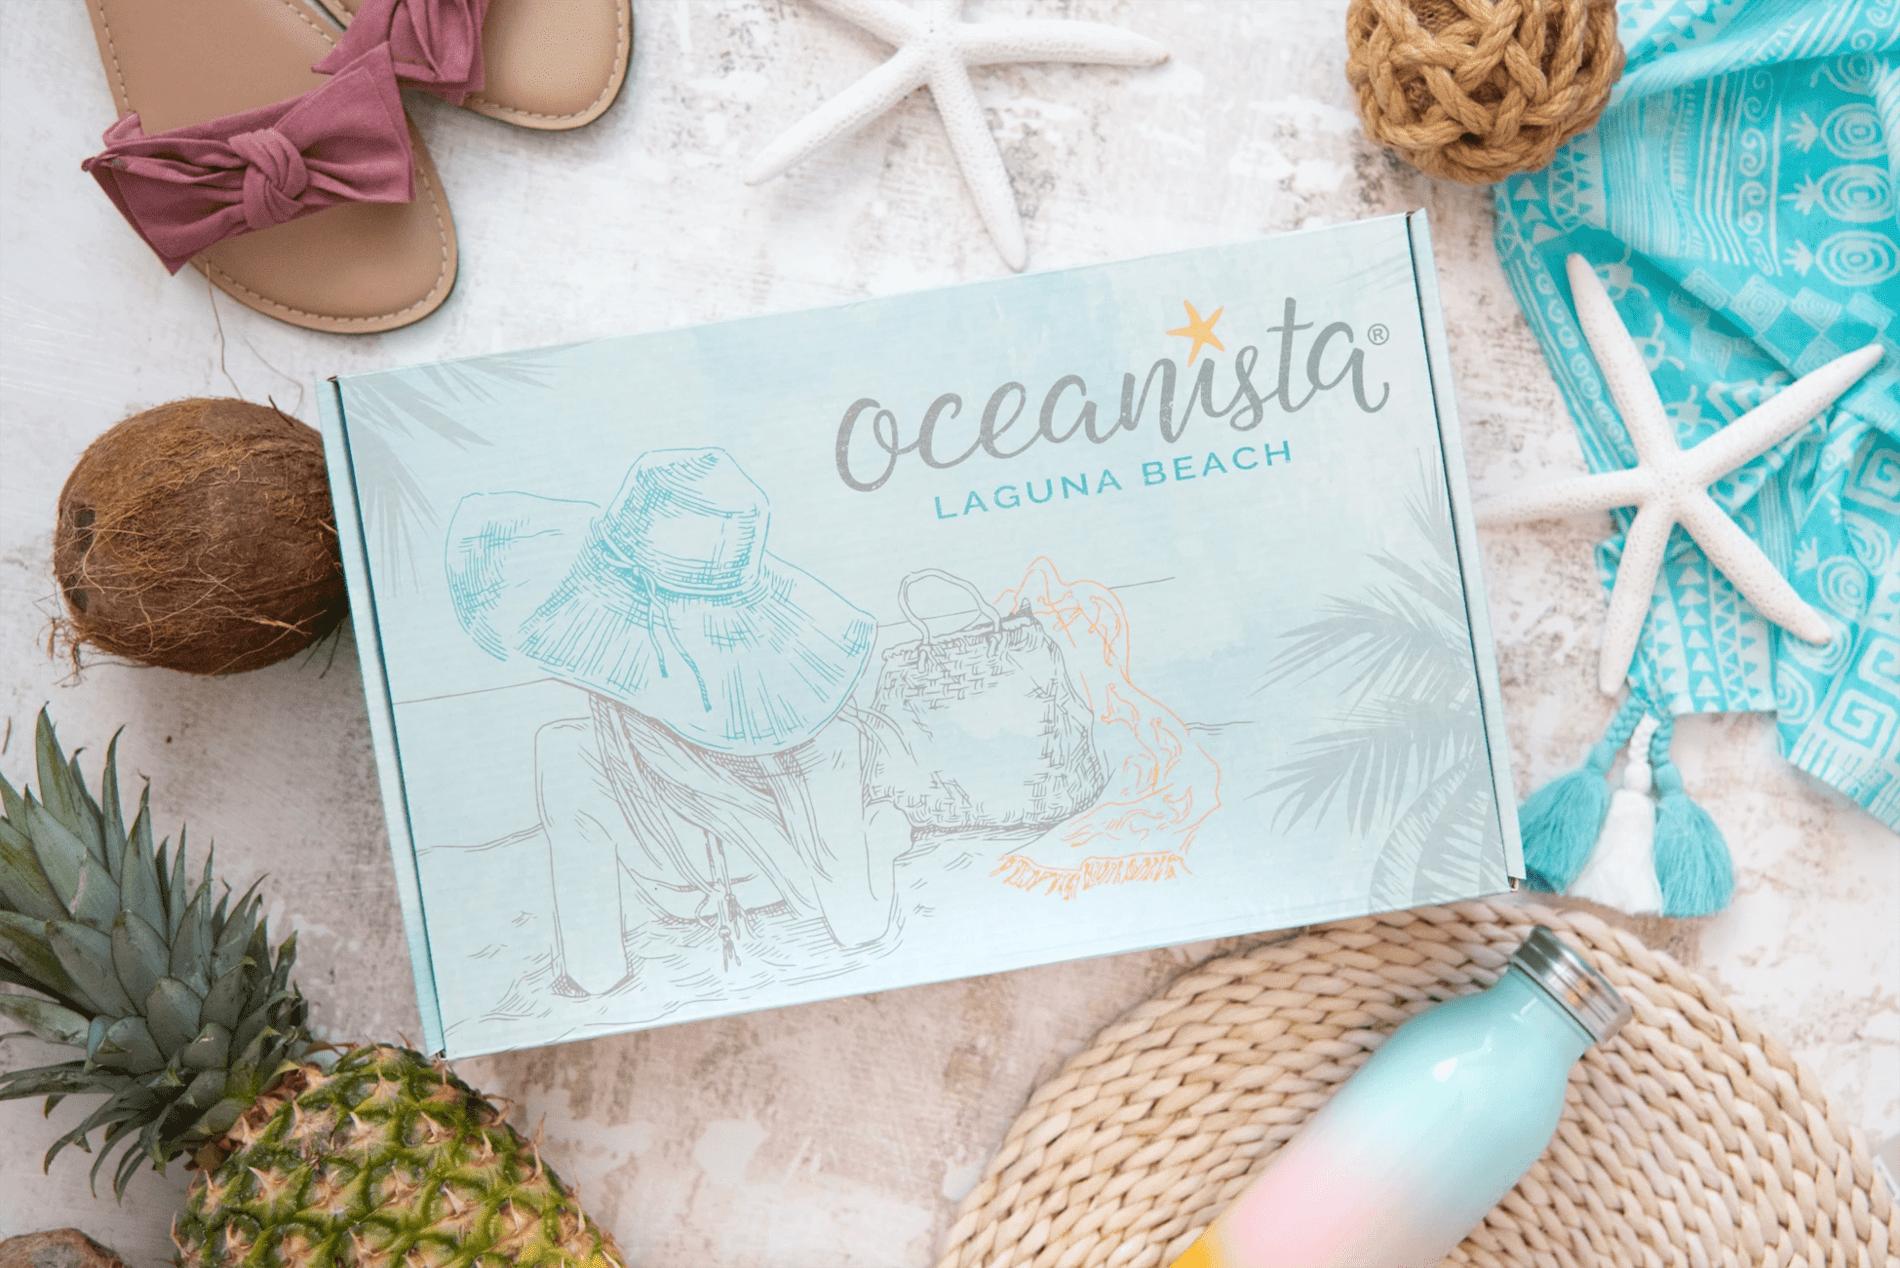 Oceanista Spring 2021 Spoiler #3 + Coupon Code!